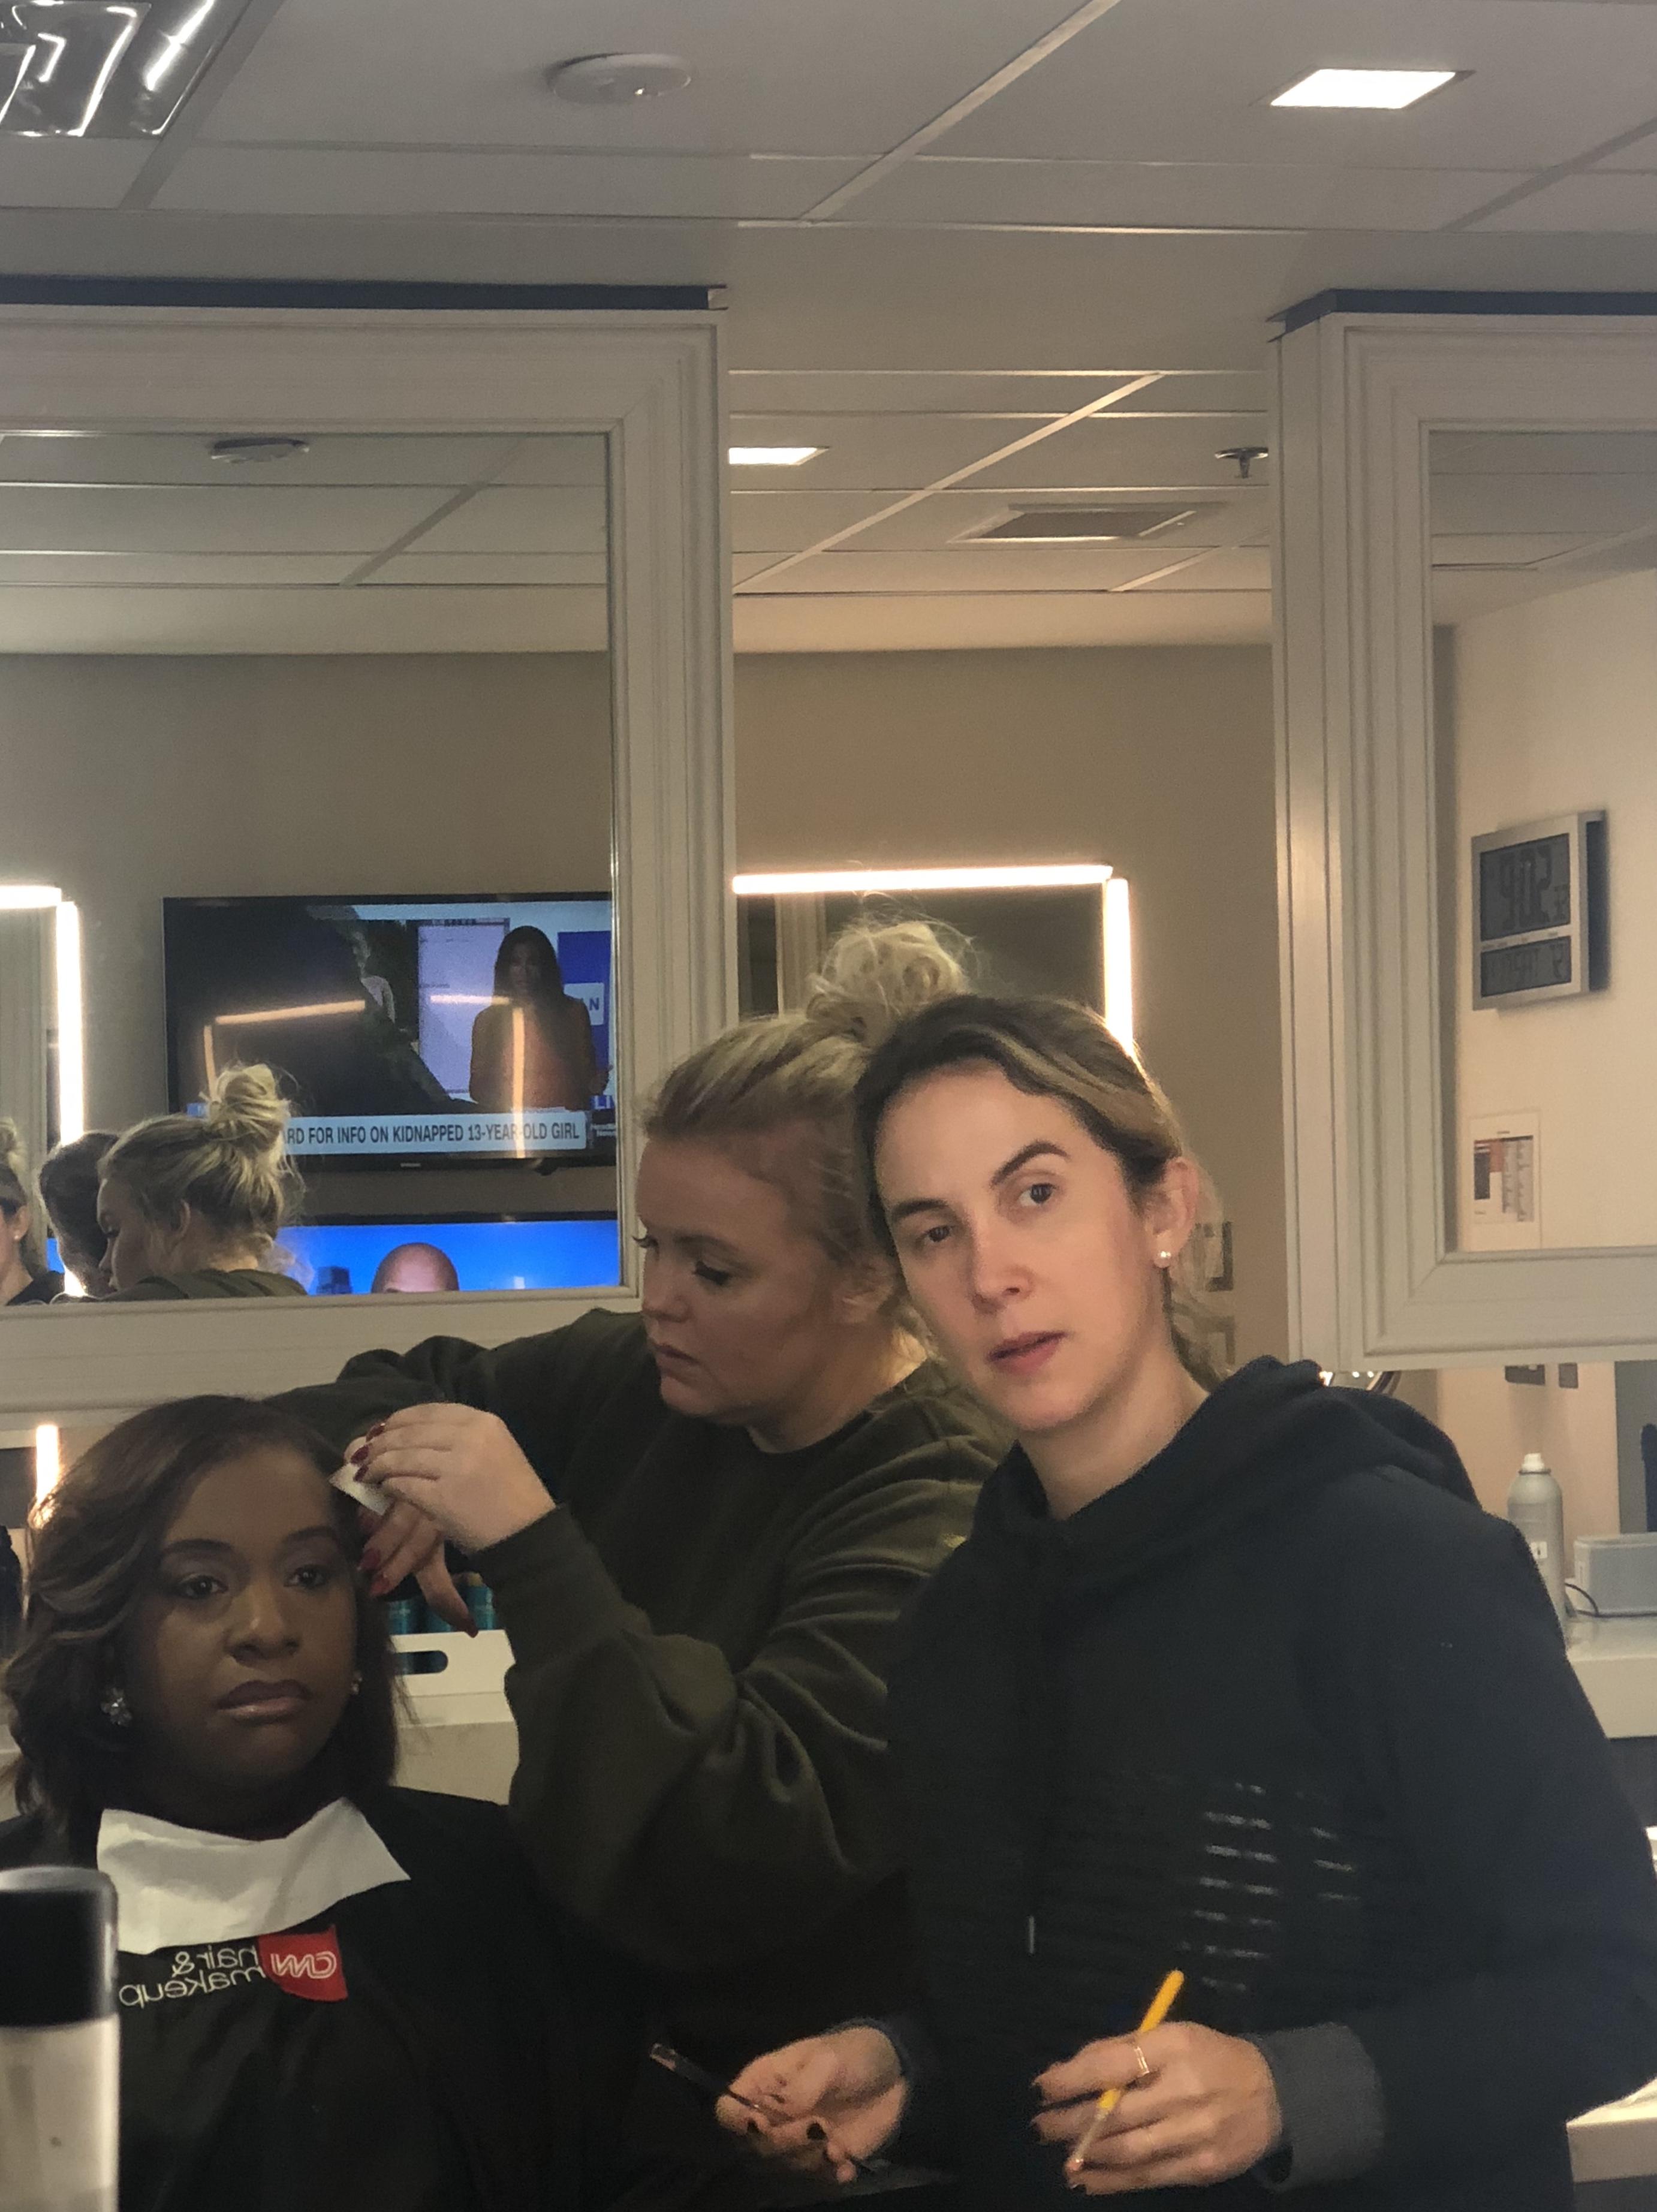 CNN - HairMakeup